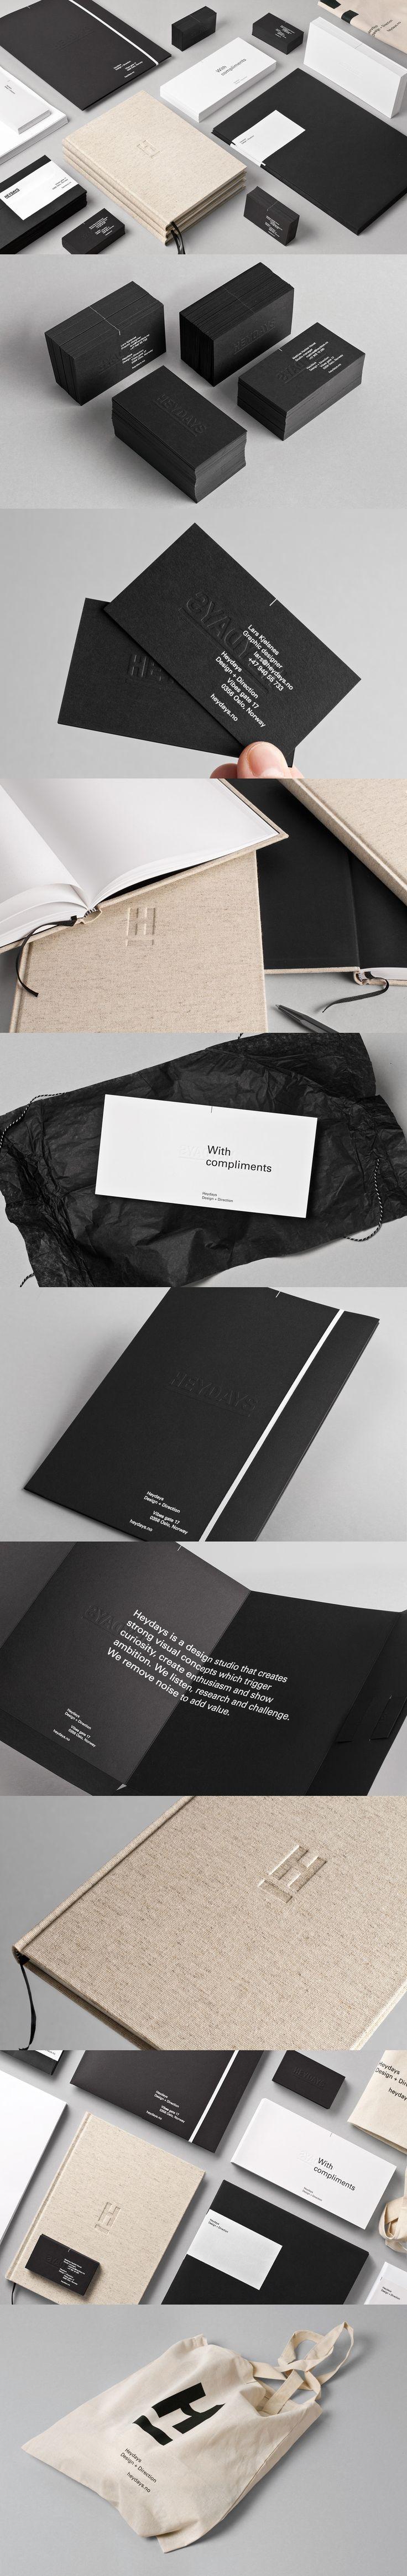 Heydays branding  design identity